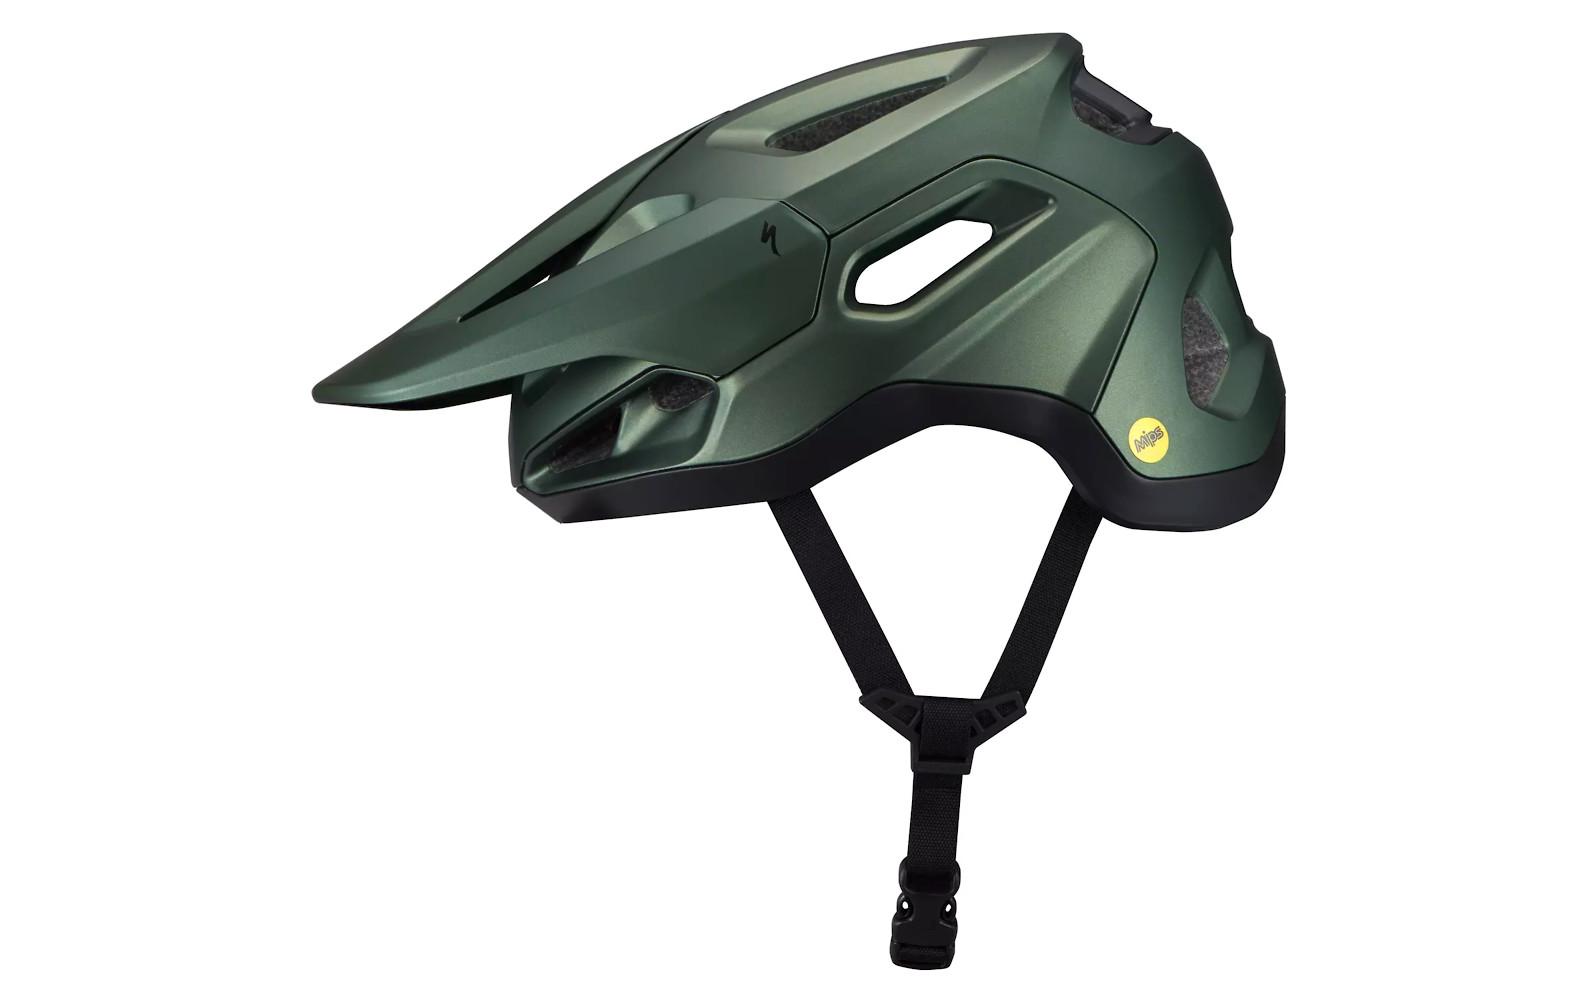 2022 Specialized Tactic 4 (oak green)